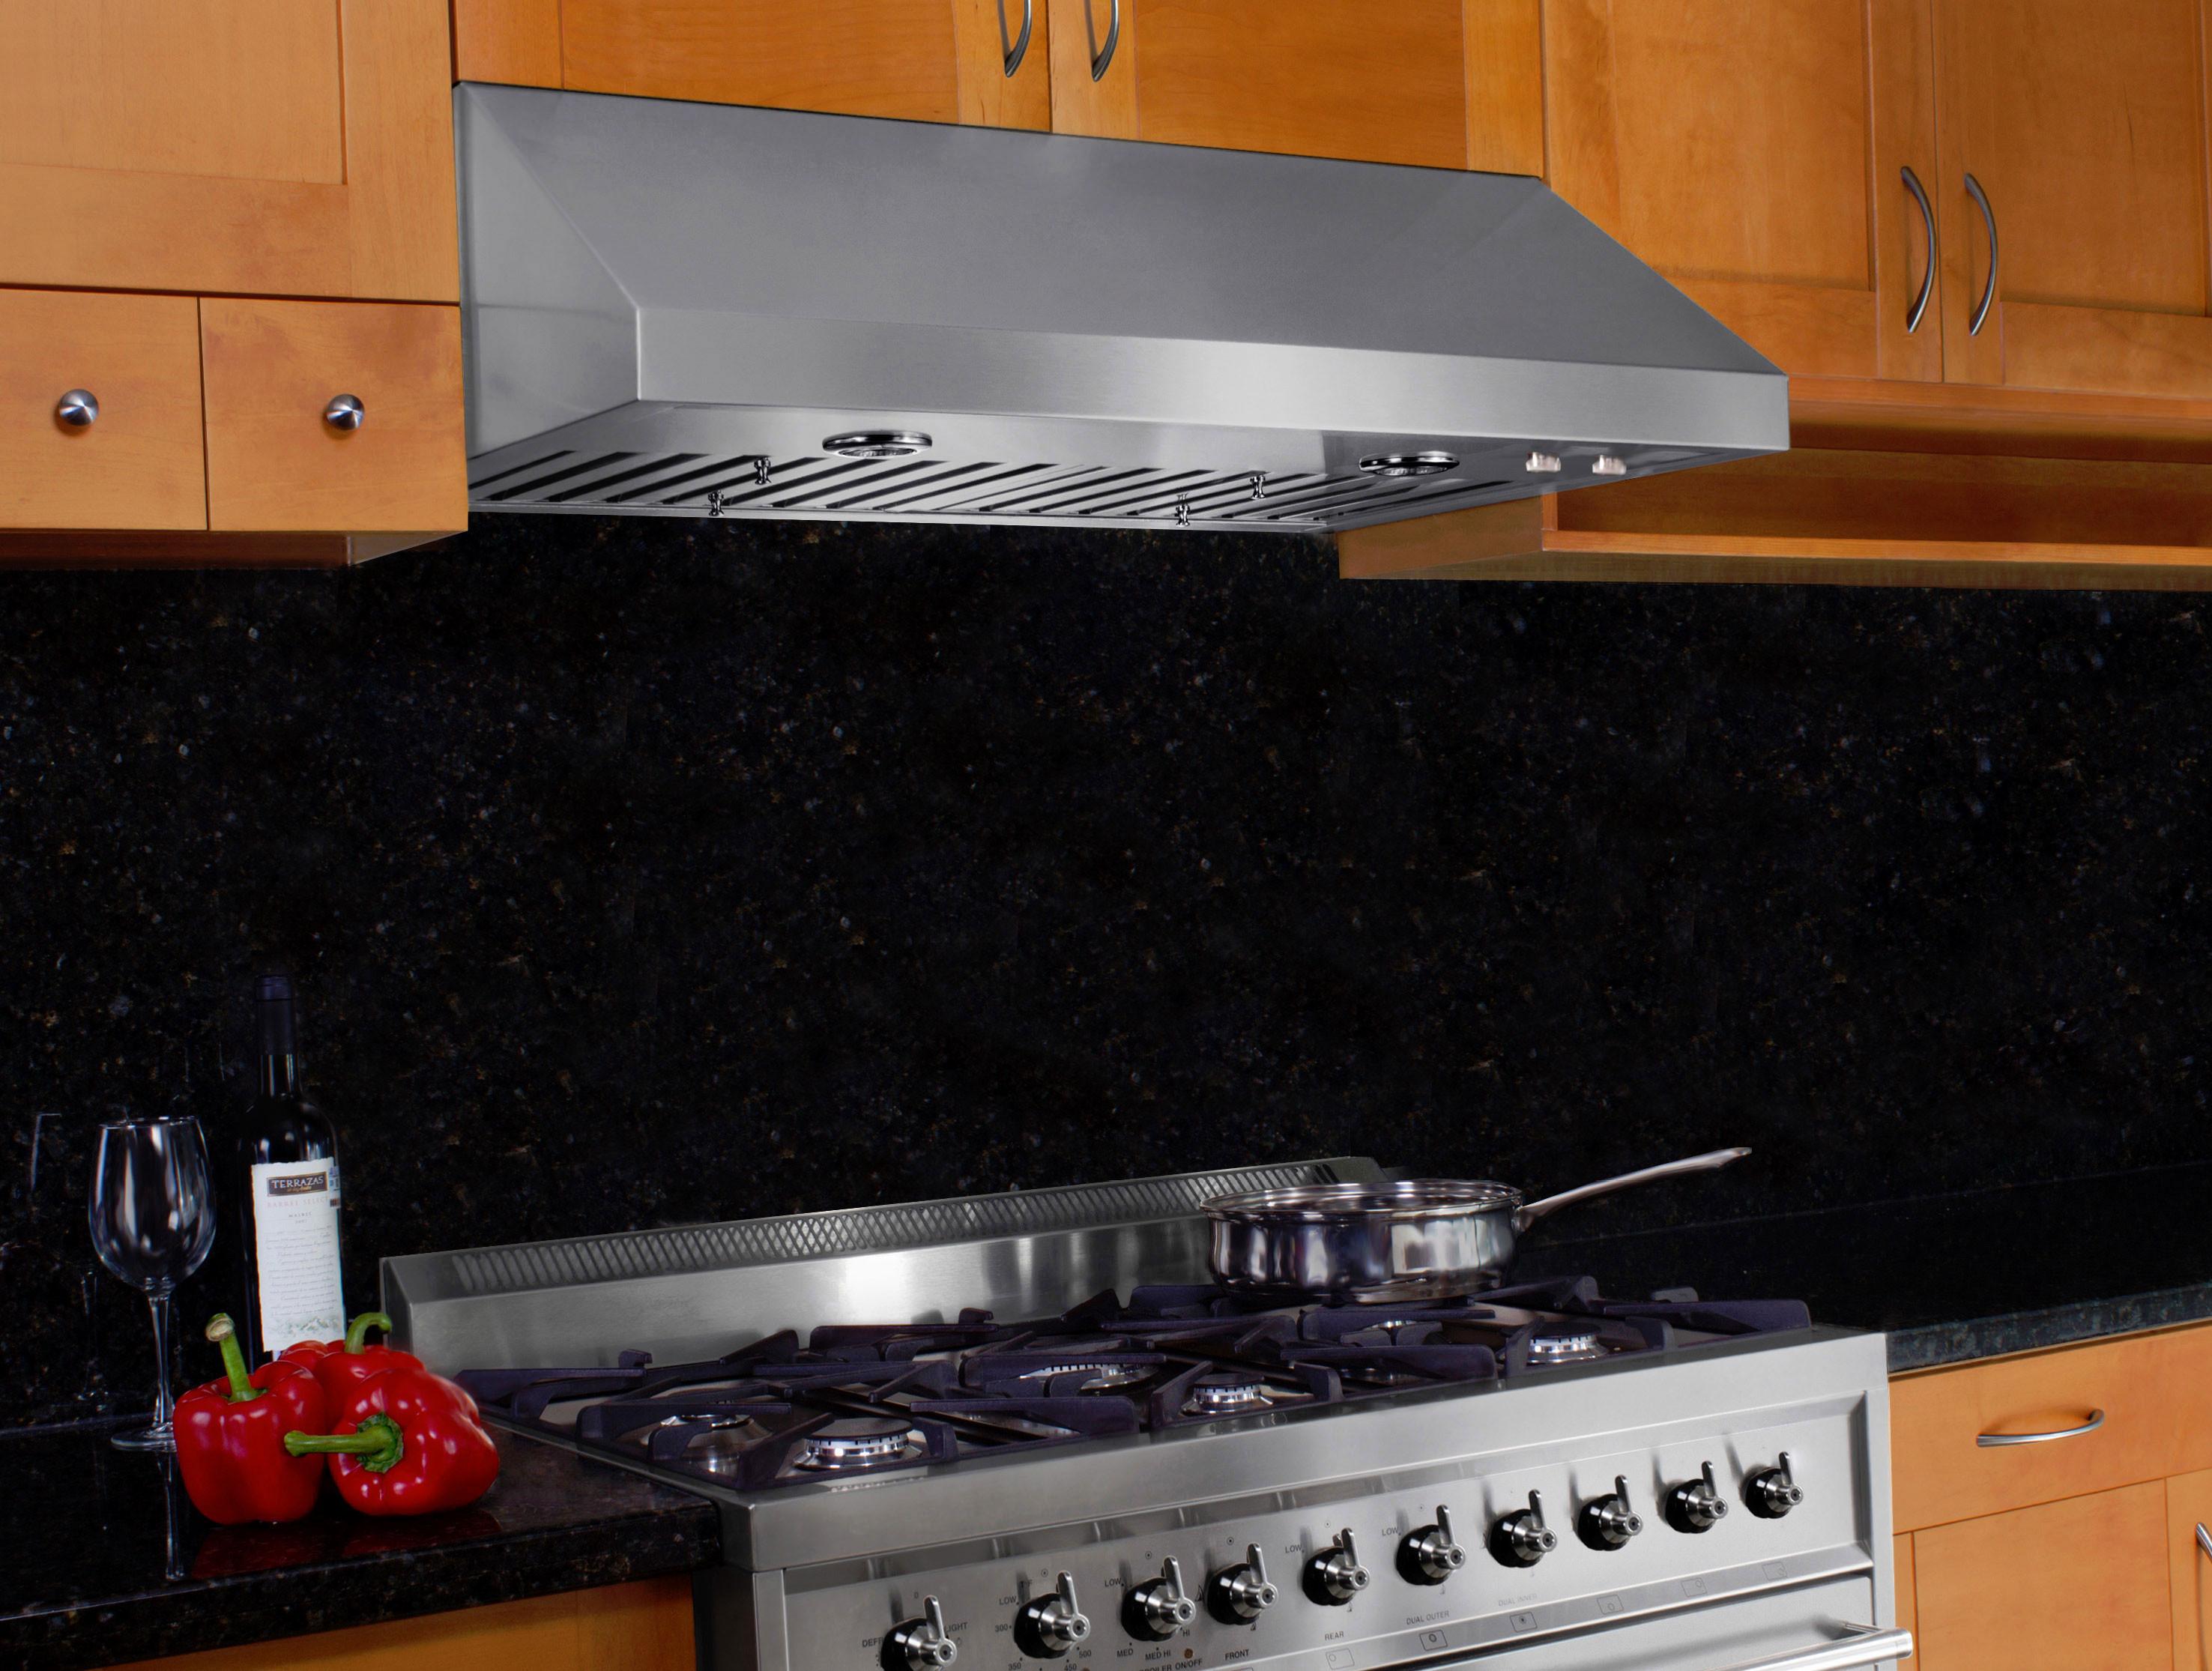 Elica Ecv630s2 30 Inch Under Cabinet Range Hood With 600